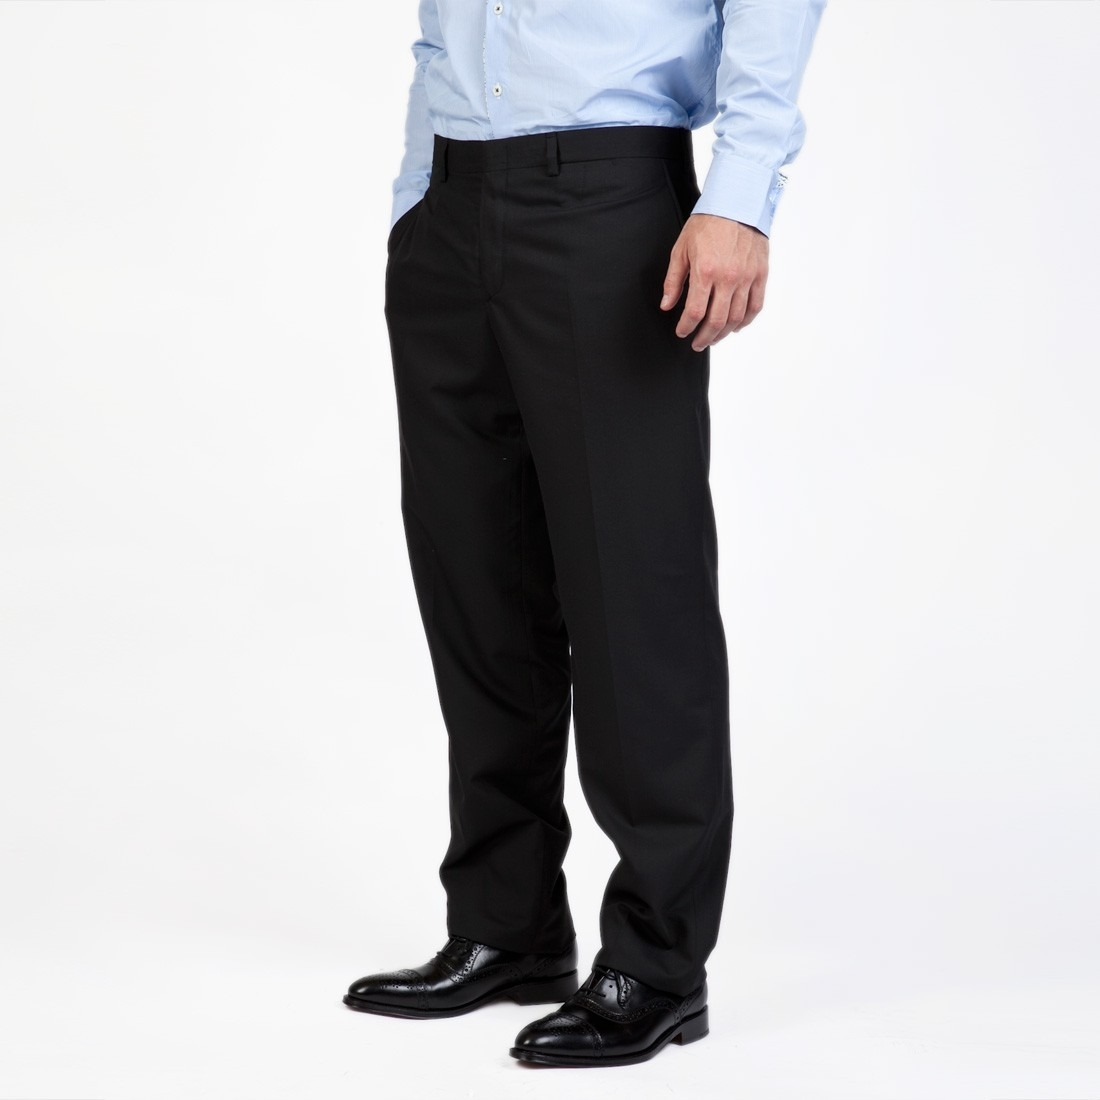 96 De Vestir Hombre Y En 649 Traje Uniformes camisas Pantalon P8q1Z1